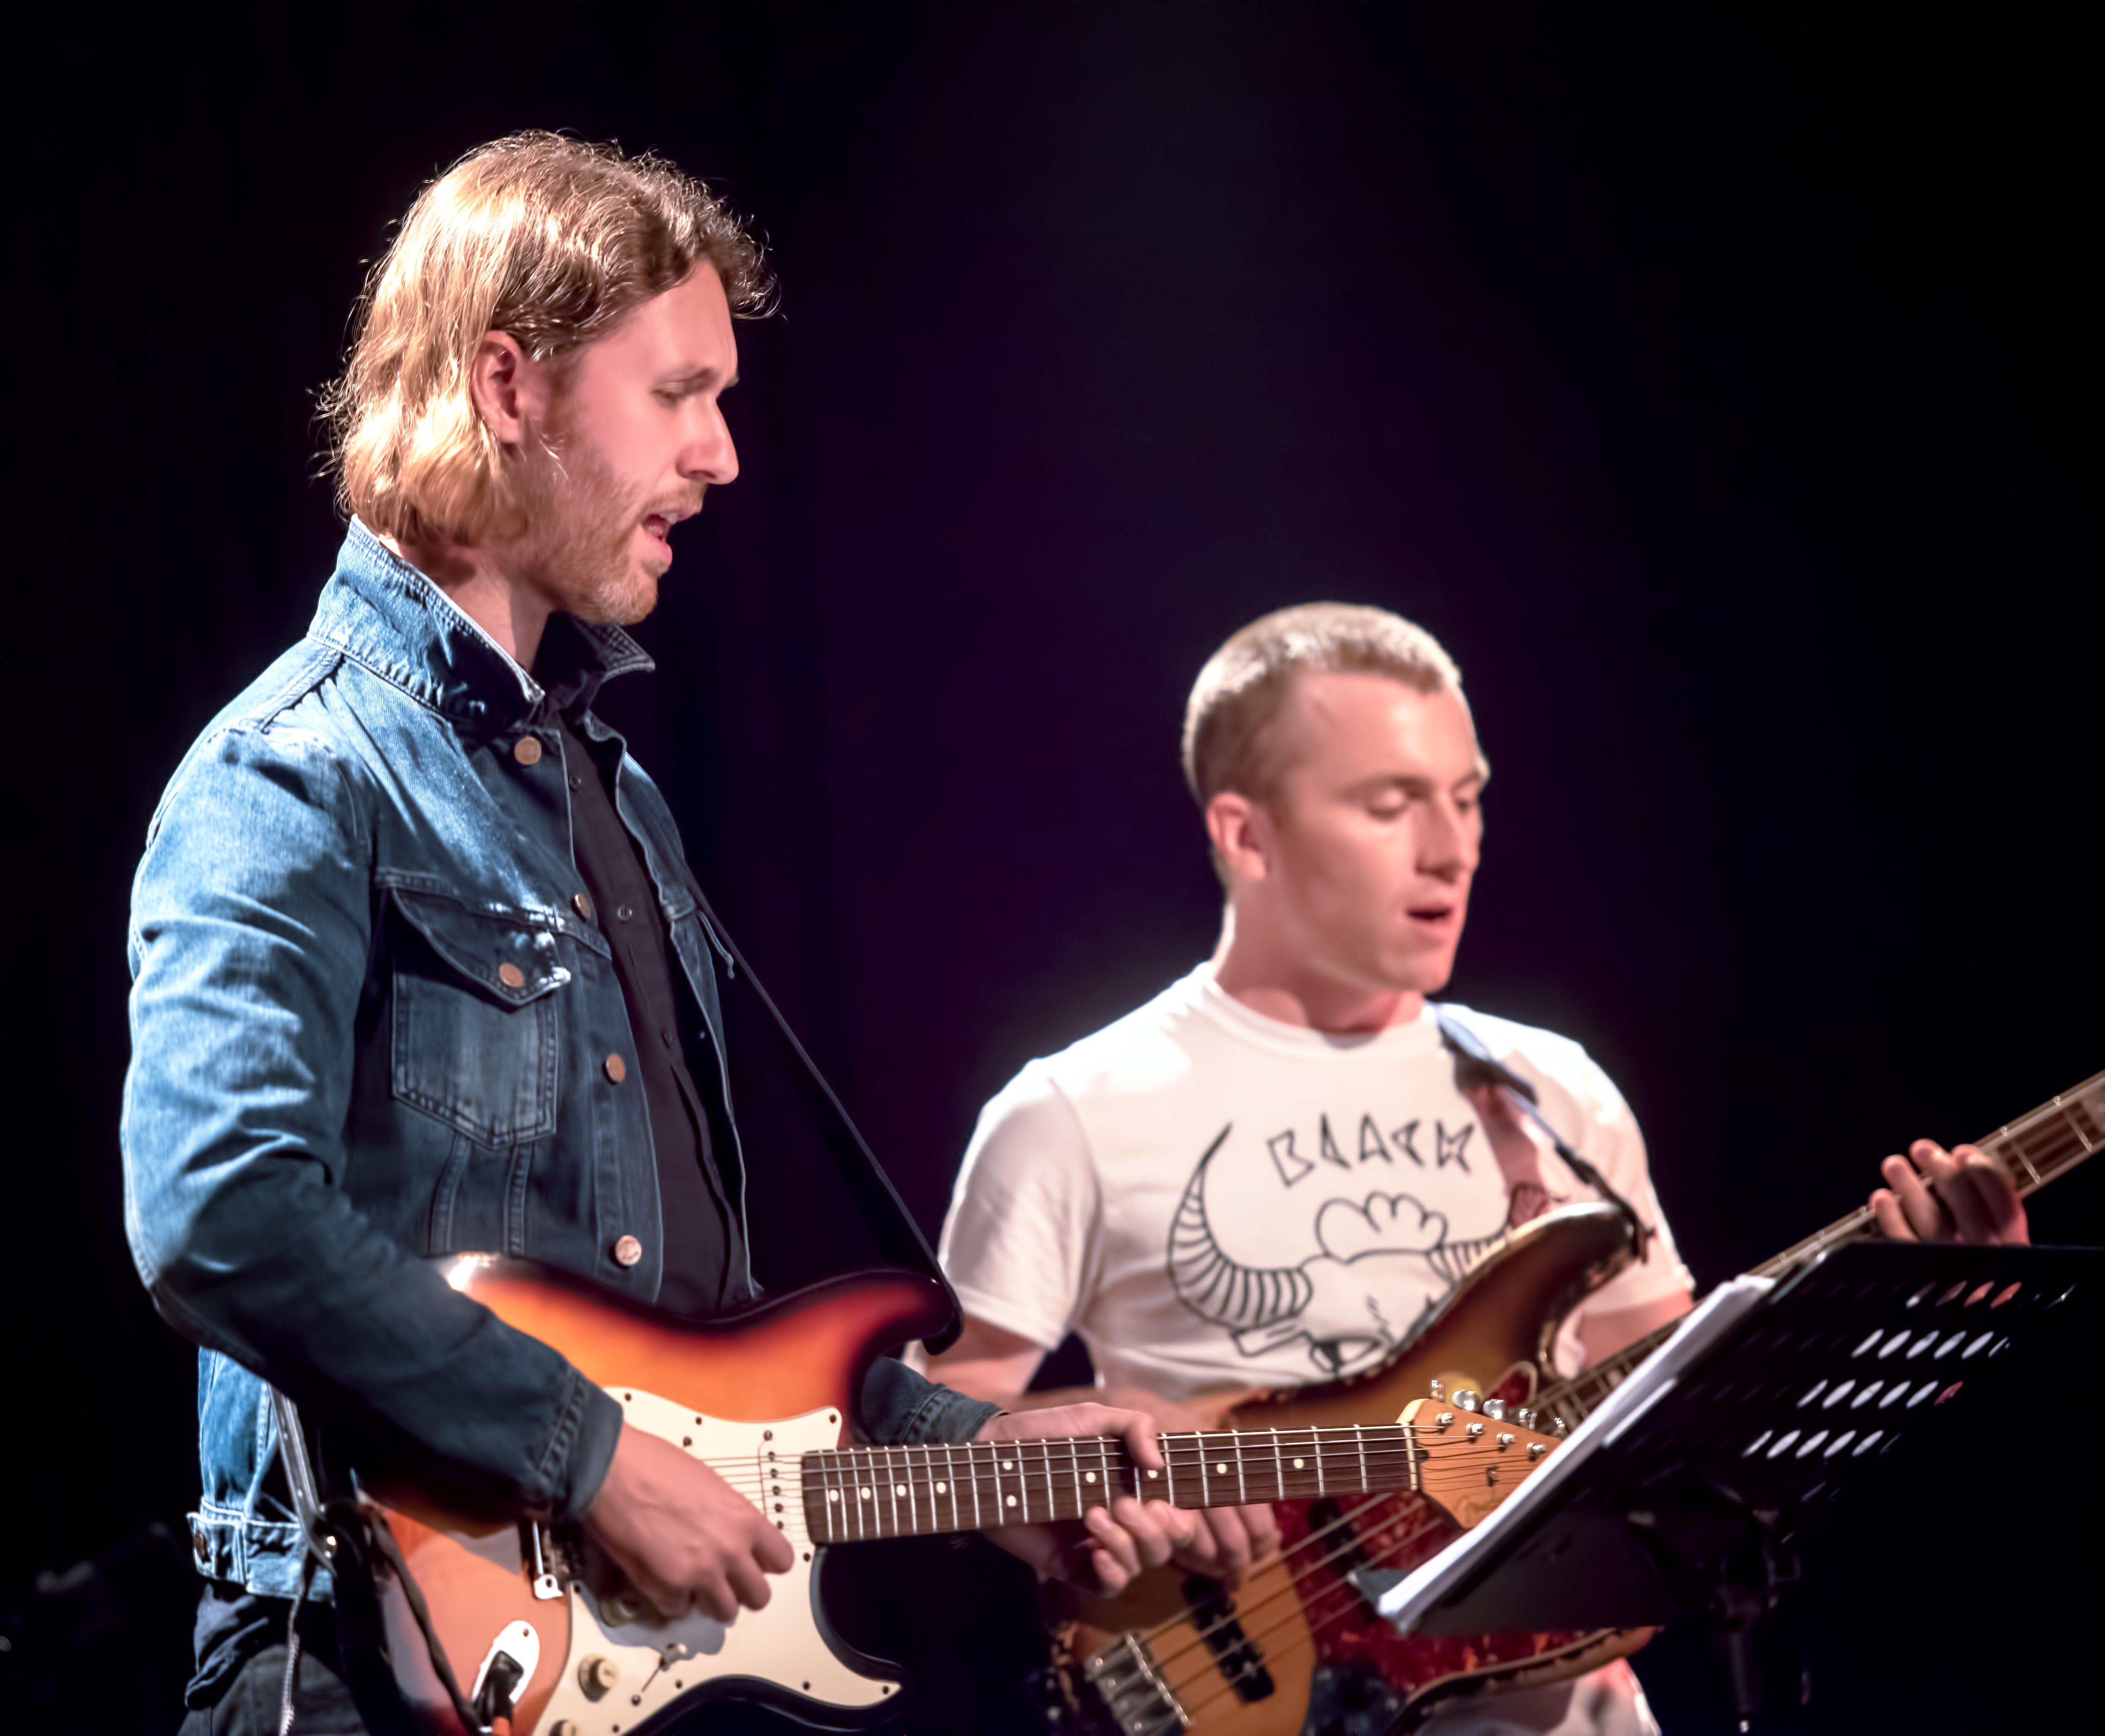 Nir Felder And Remi-jean Leblanc With Ensemble Remi-jean Leblanc At The Montreal International Jazz Festival